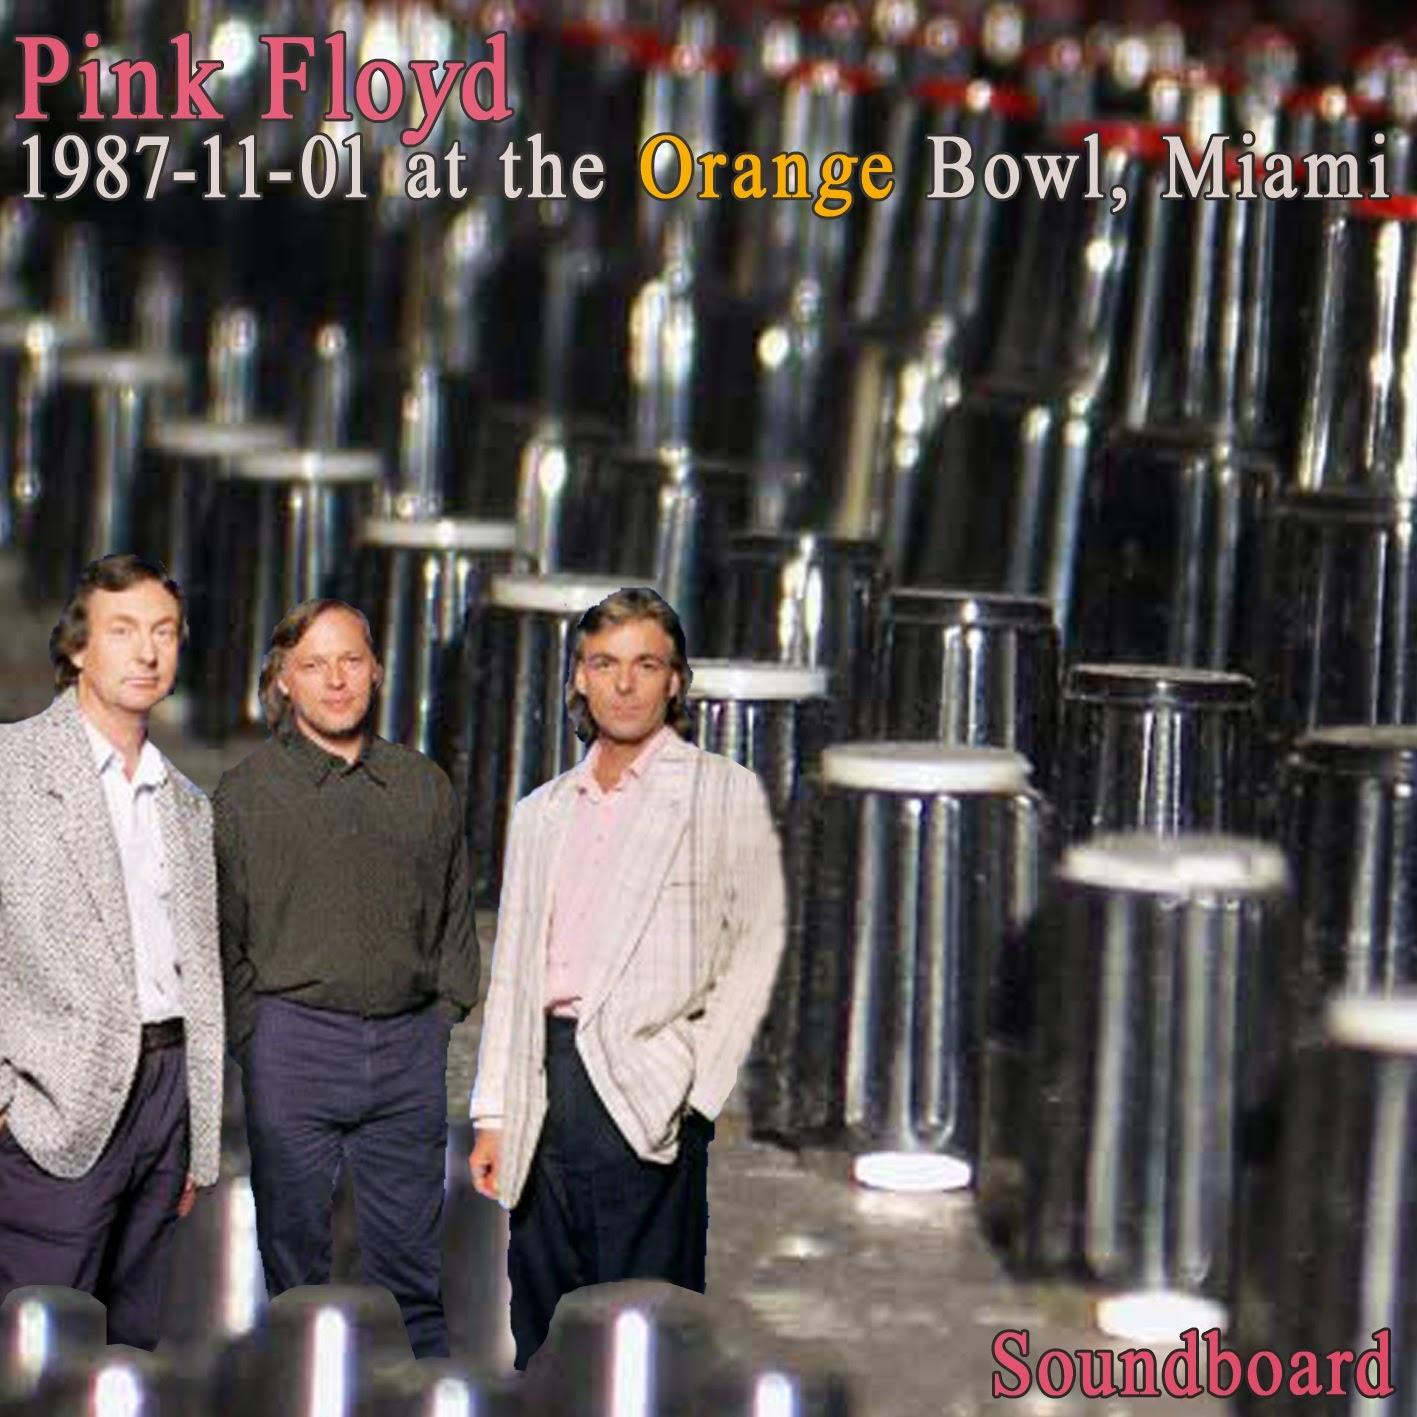 Quality Bootlegs Pink Floyd Miami 1987